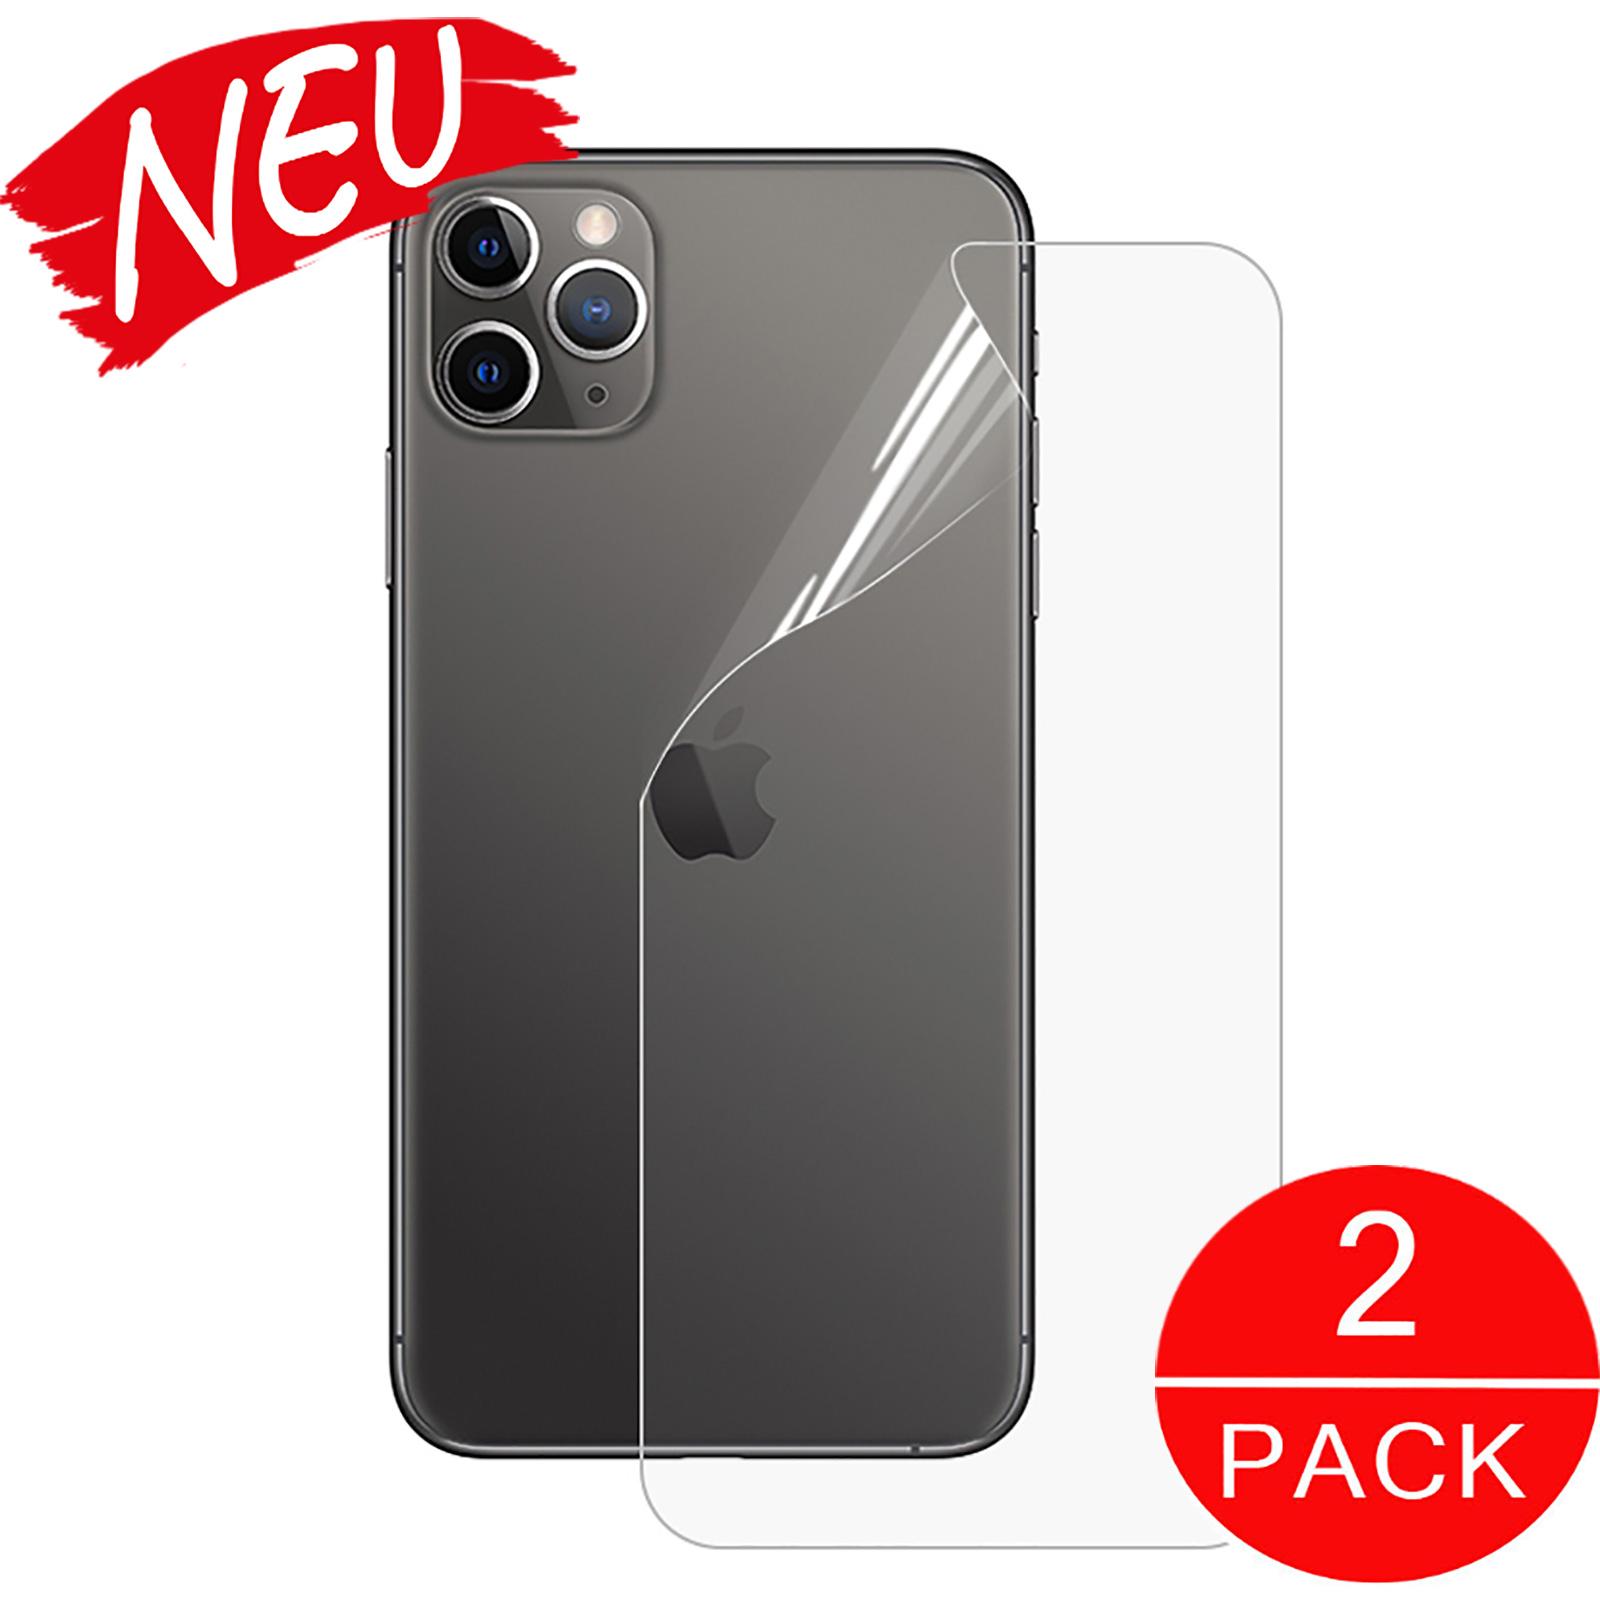 Hydrogel Schutzfolie Handy Rückseite Backcover iPhone11 Pro Max